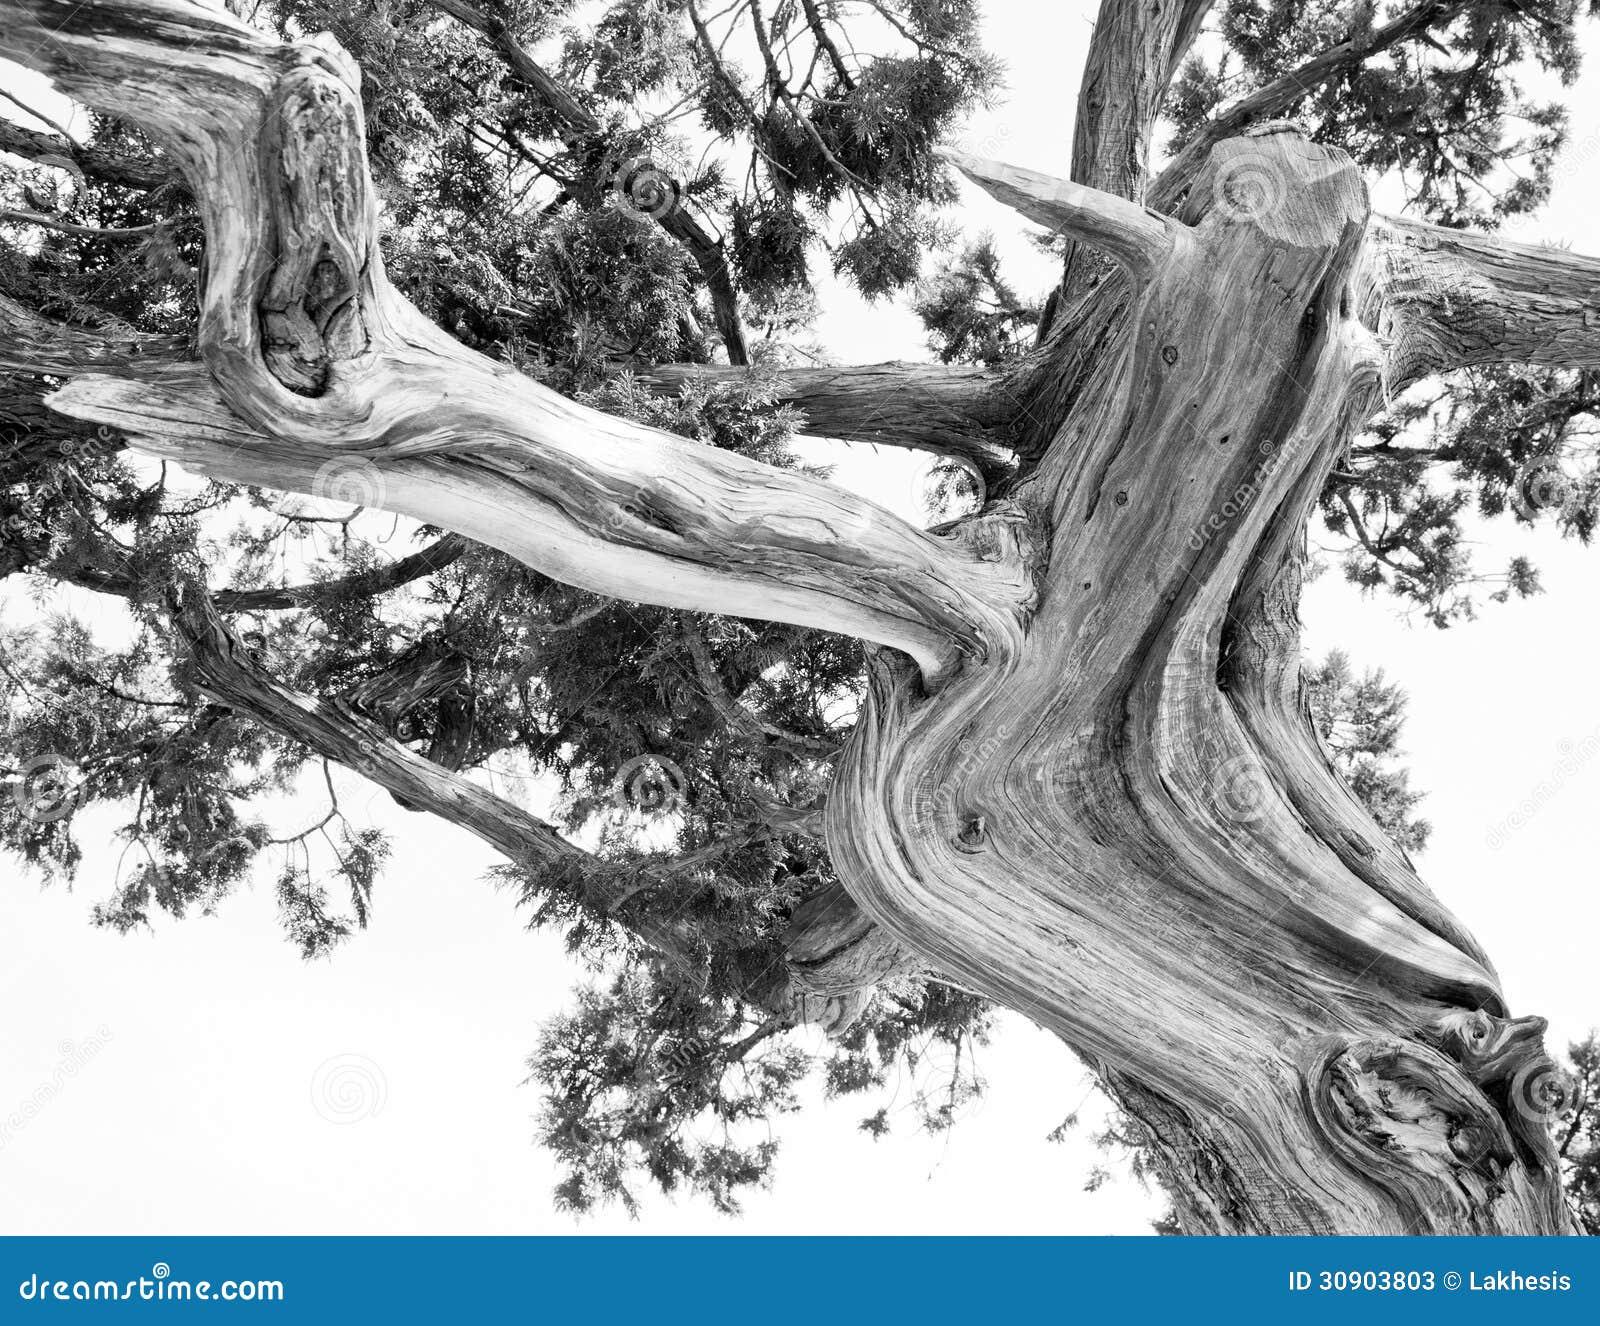 About Pine Tree Silhouette On Pinterest Pine Tree Tattoo Pine Tree